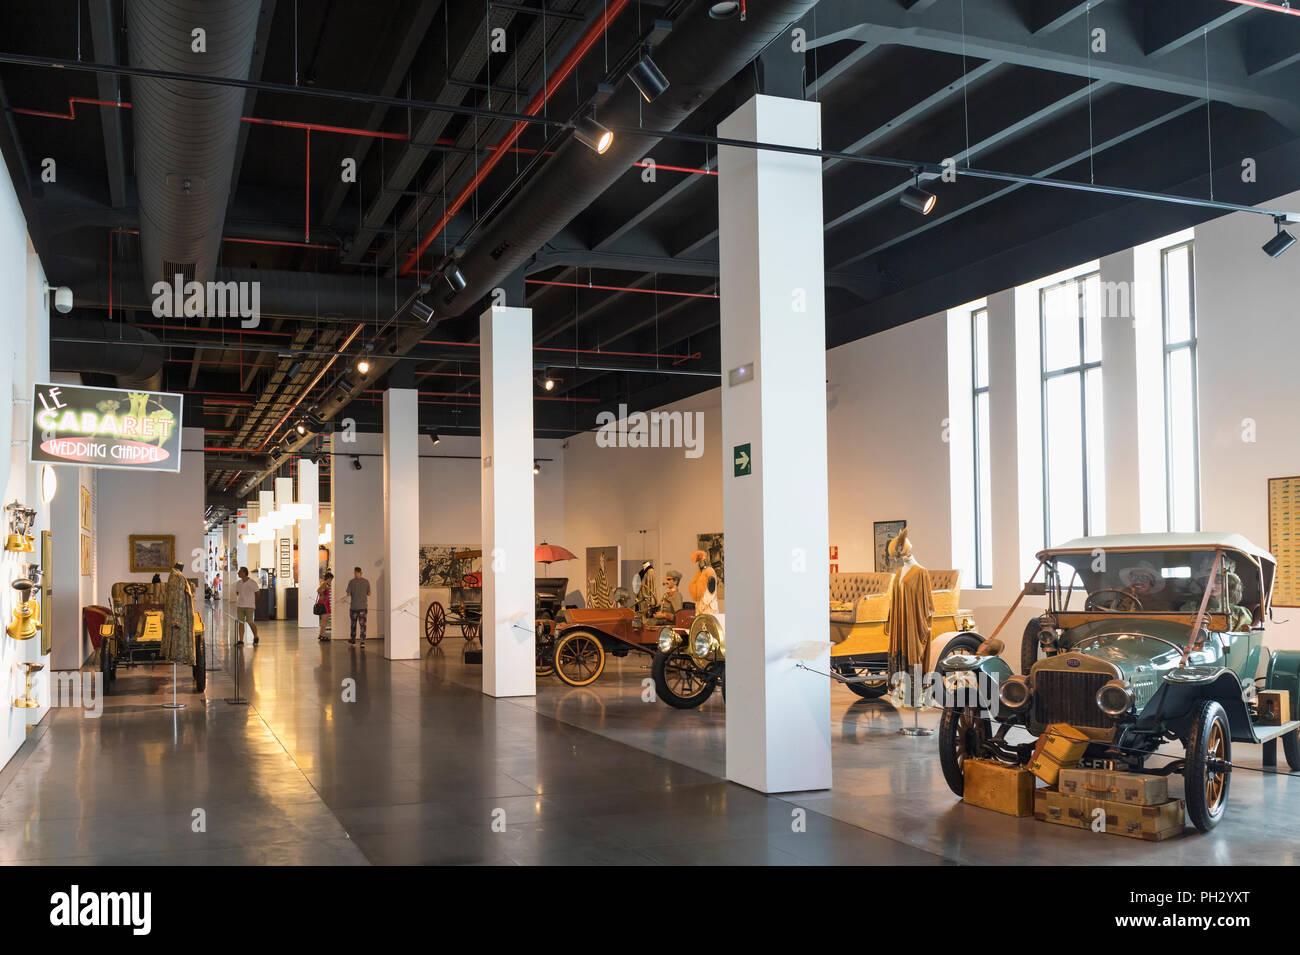 Museo Automovilistico y de la Moda, Malaga, Malaga Province, Spain.  Automobile and Fashion Museum.  Part of the display. - Stock Image